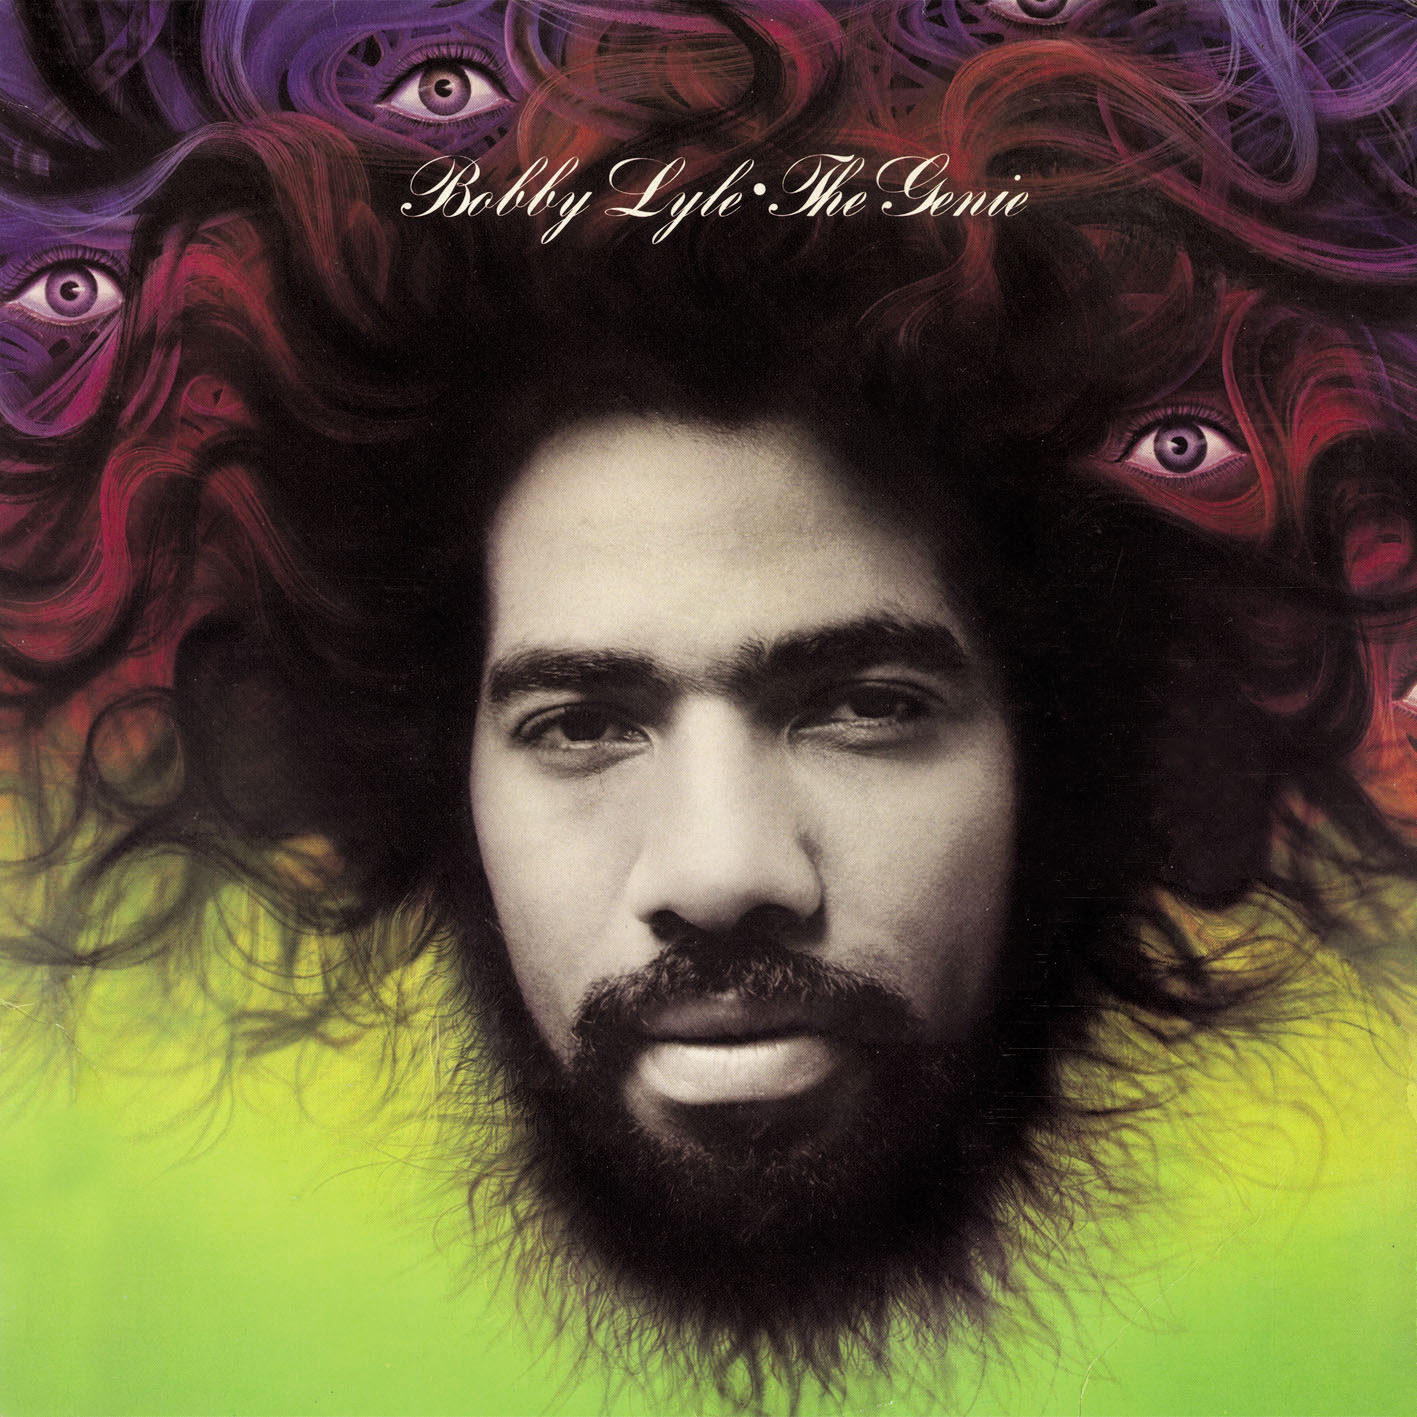 Bobby Lyle/THE GENIE CD